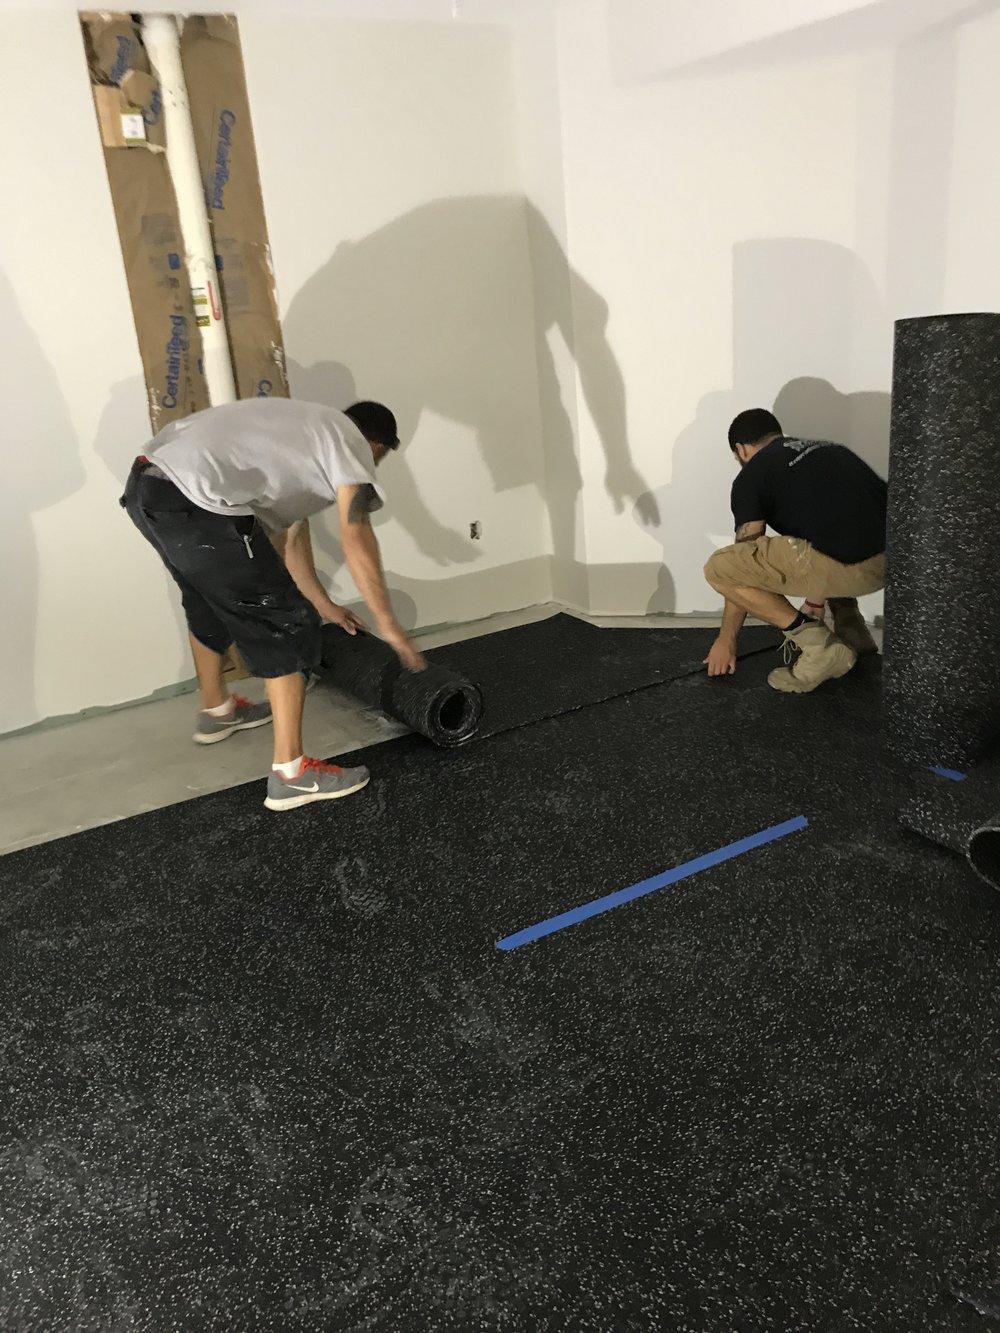 Shaw Remodeling - Progress photo - install flooring in basement finish gym area (1).JPG